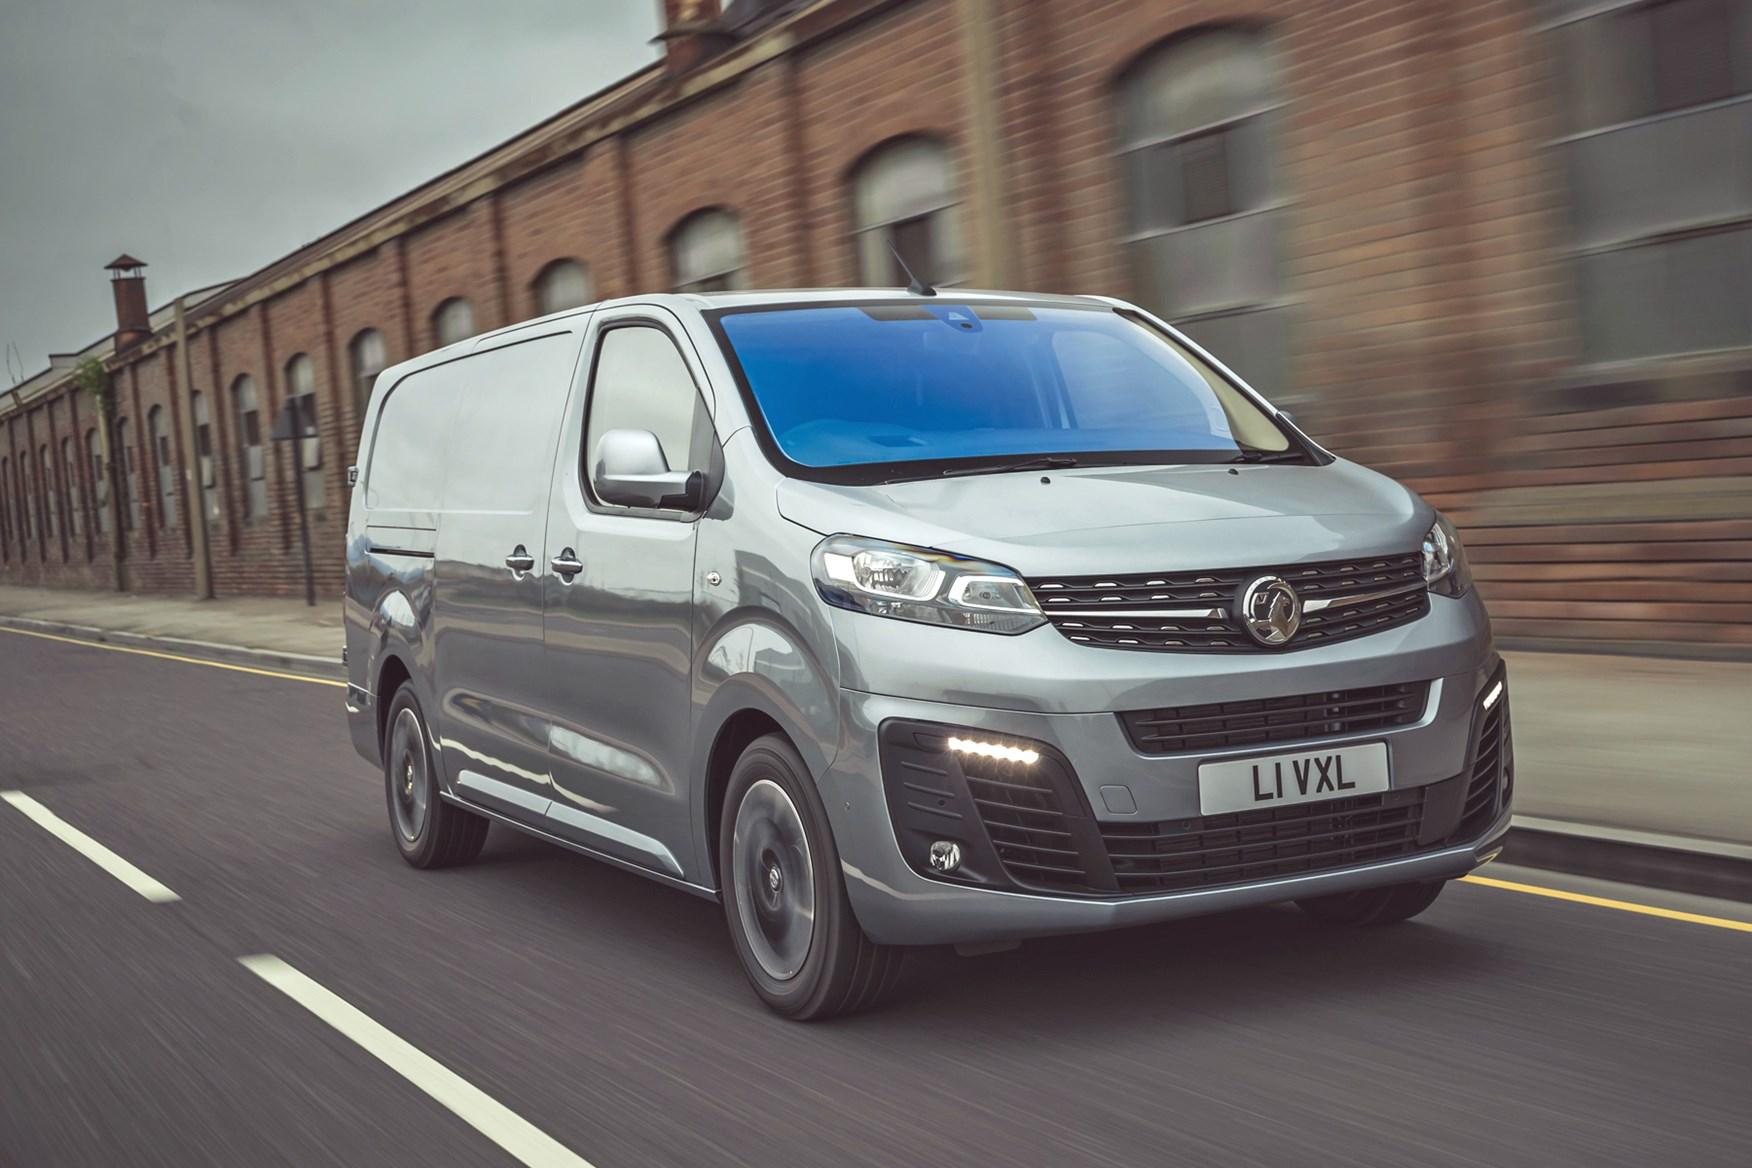 Vauxhall Vivaro-e review, 2020, electric van, front  view, driving, grey